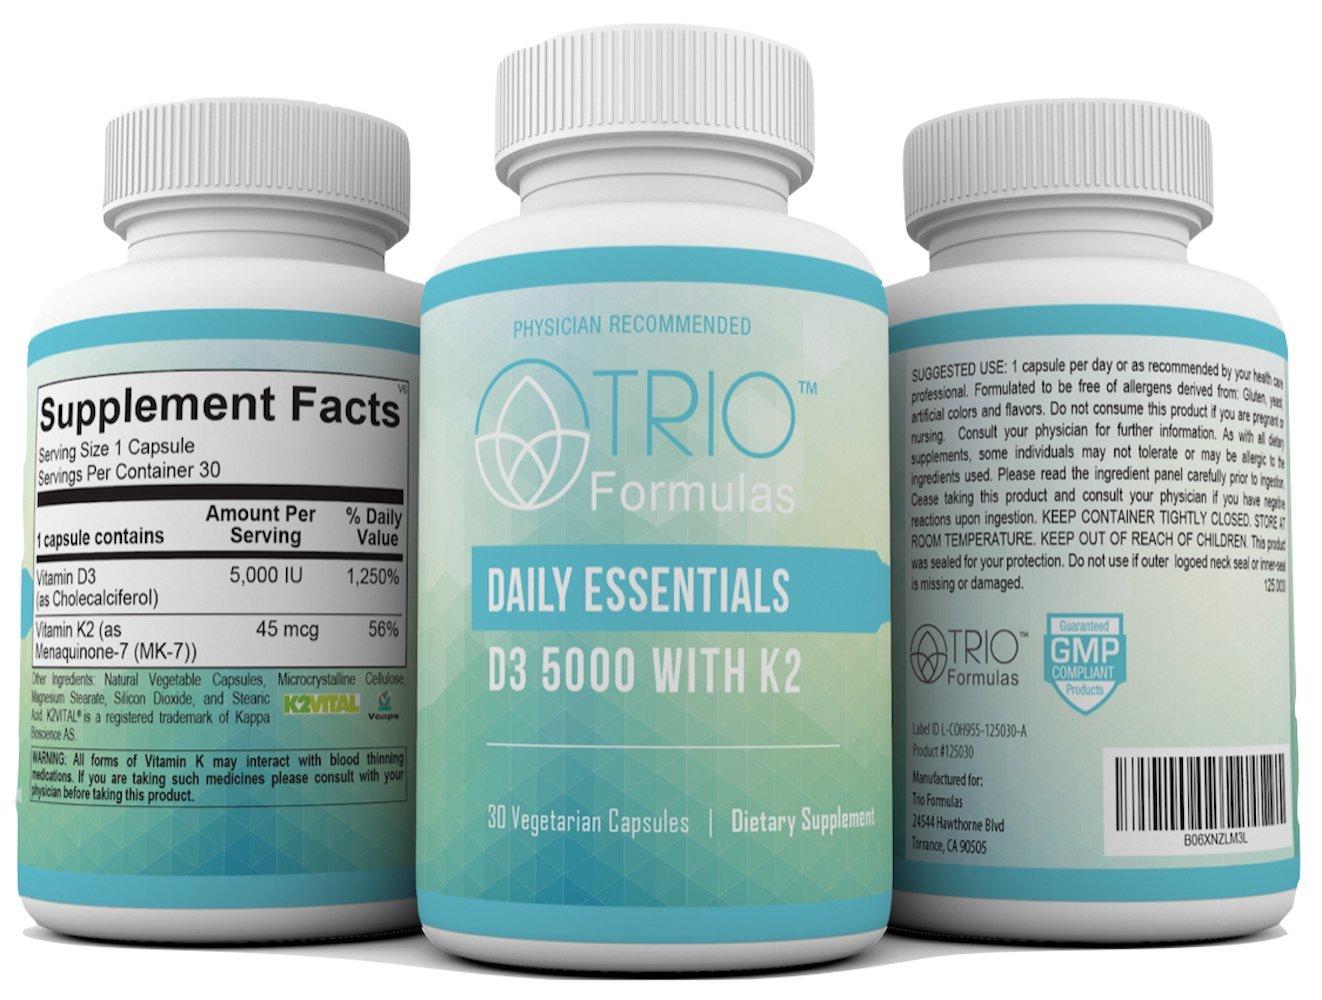 niska cena popularne sklepy zaoszczędź do 80% Details about Daily Essentials Vitamin D, D3 5000 IU With K2 (MK7)  Supplement for Strong Bones